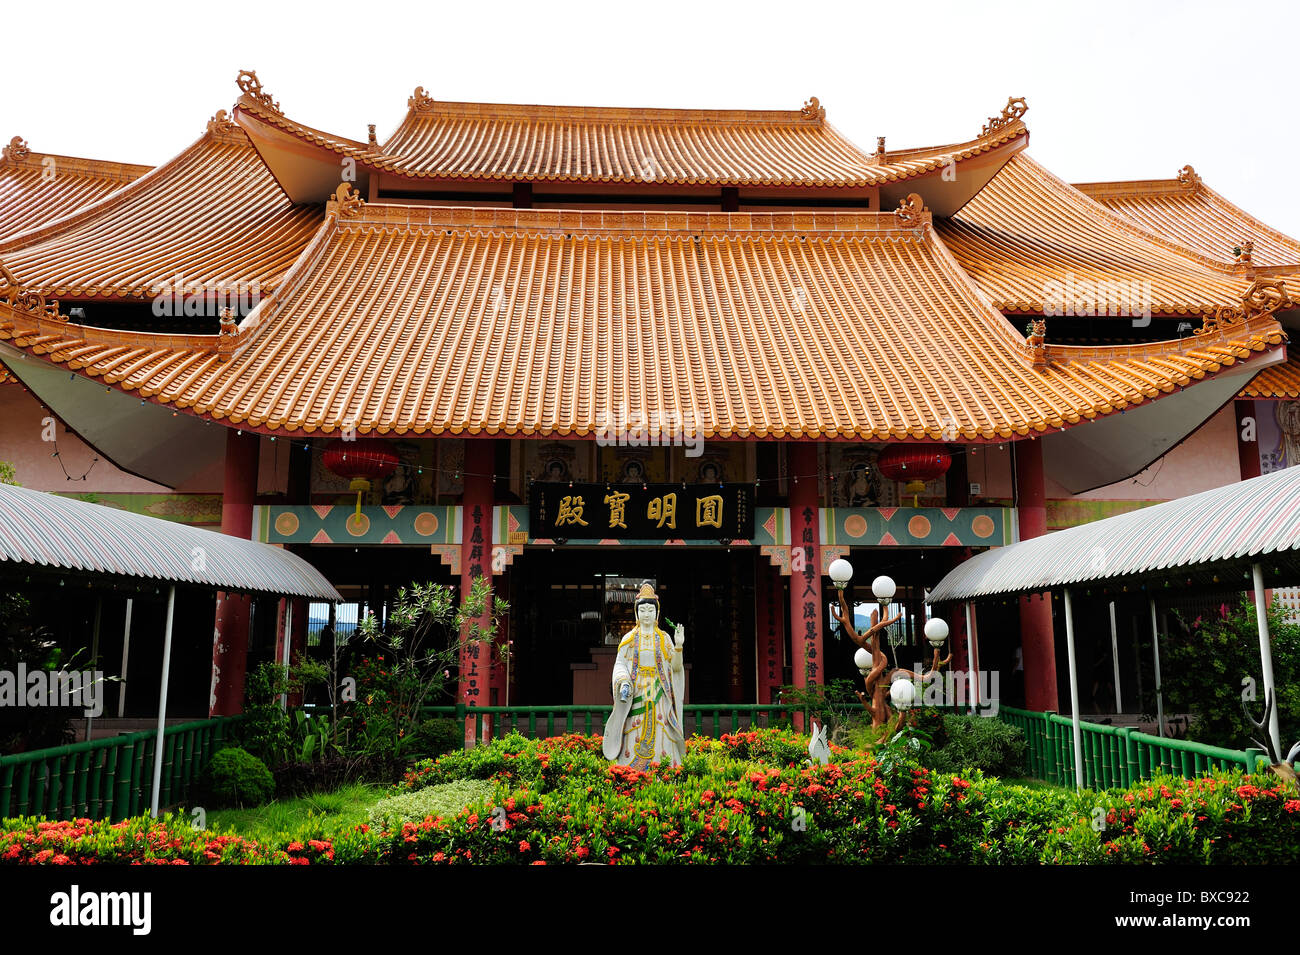 Puh Toh Si Chinese Temple near Kota Kinabalu, Sabah - Stock Image